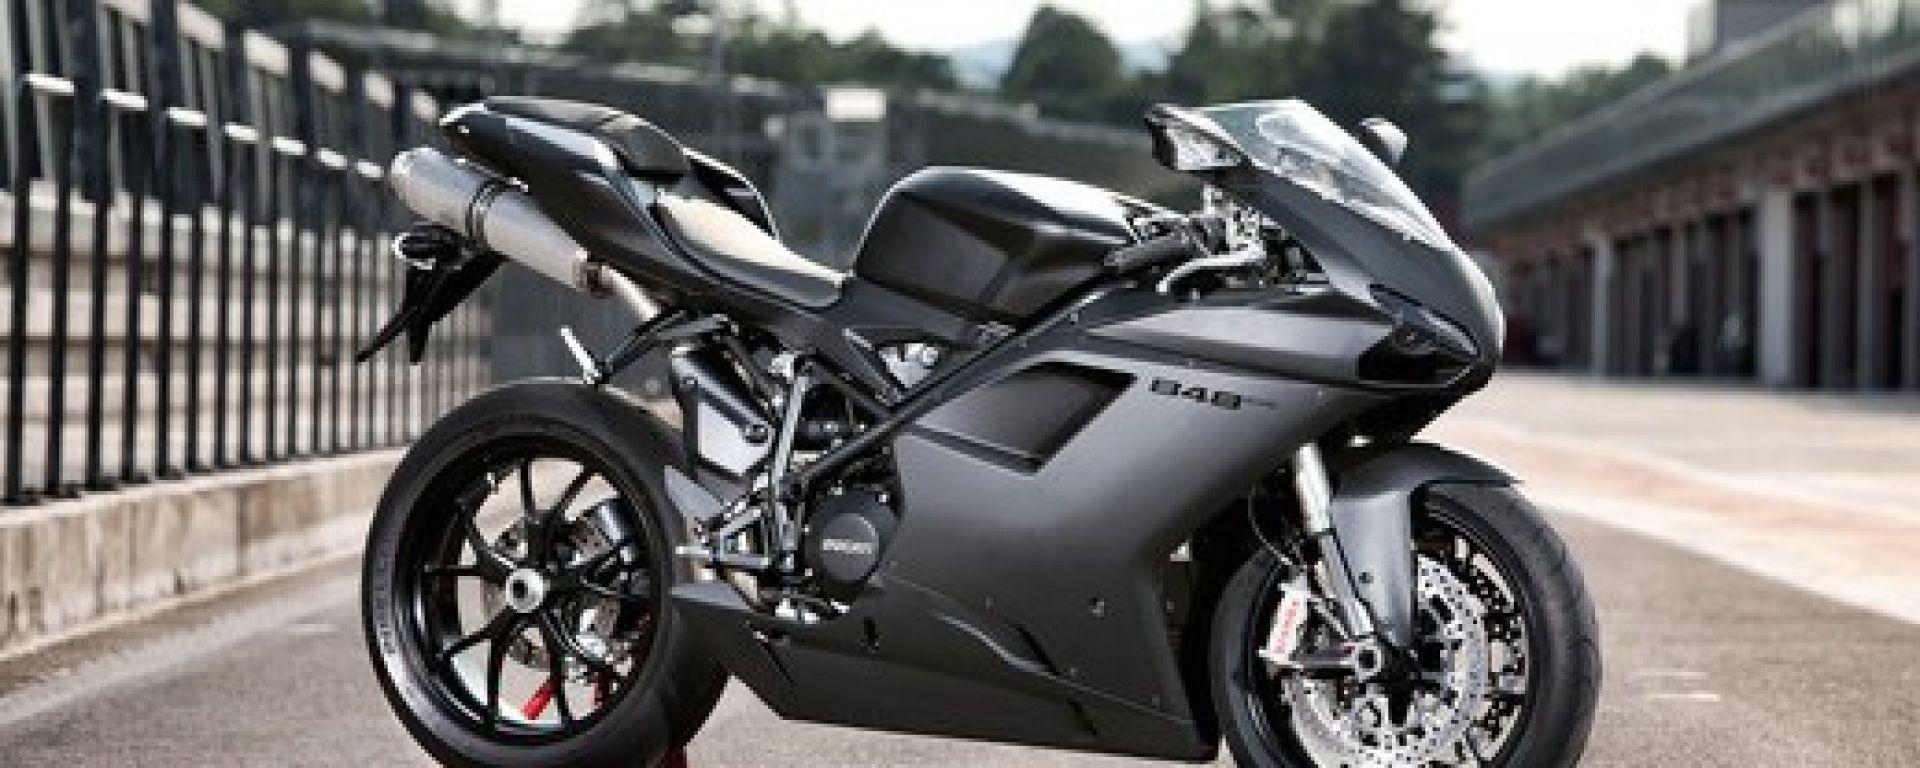 Ducati 848EVO